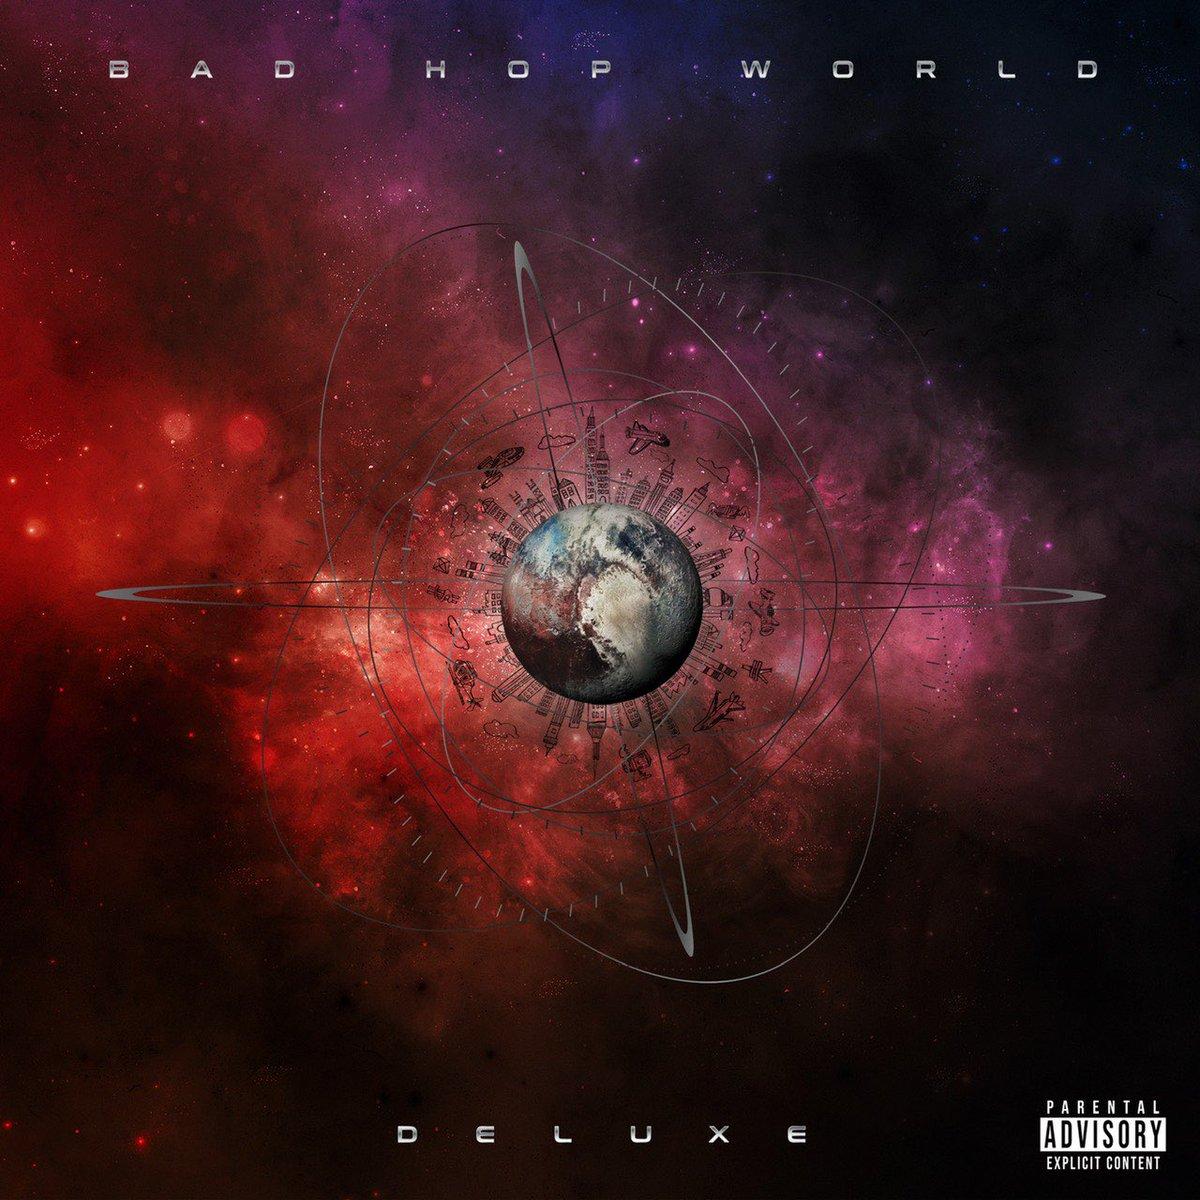 『BAD HOP - No Melody feat. Benjazzy, Leon Fanourakis, Hezron & T-Pablow 歌詞』収録の『BAD HOP WORLD DELUXE』ジャケット